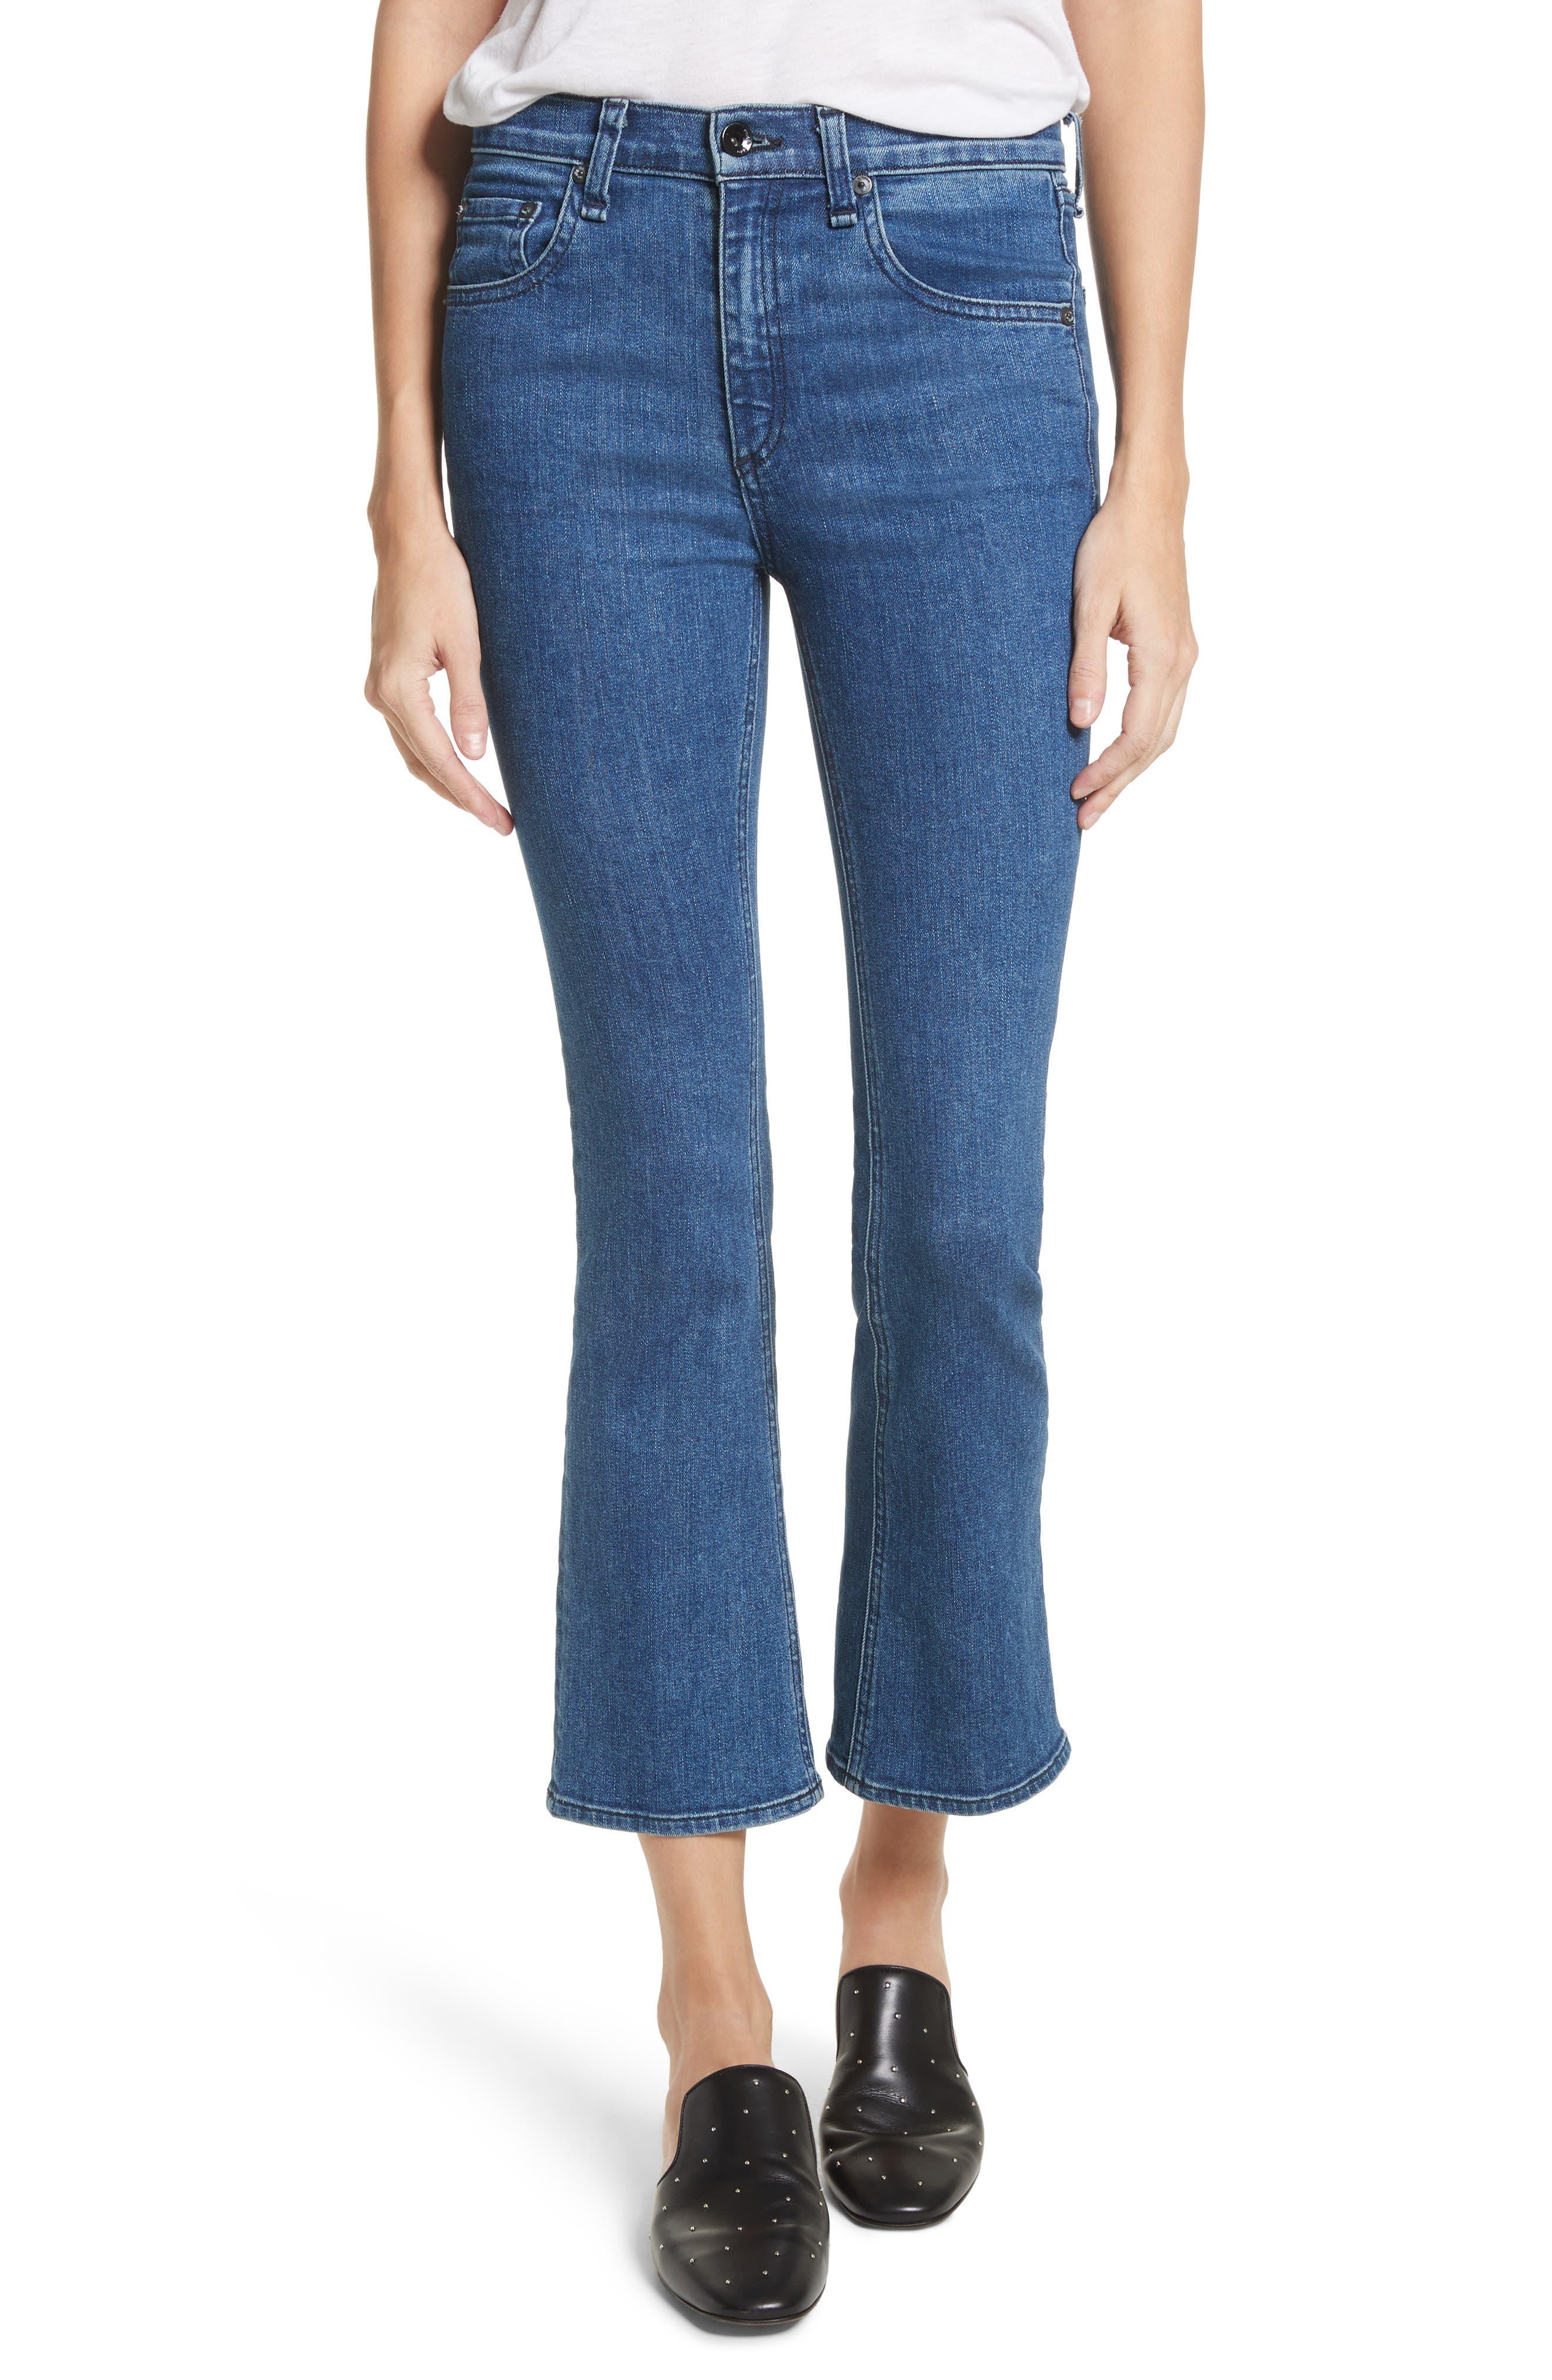 Hana High Waist Crop Bootcut Jeans,                             Main thumbnail 1, color,                             420